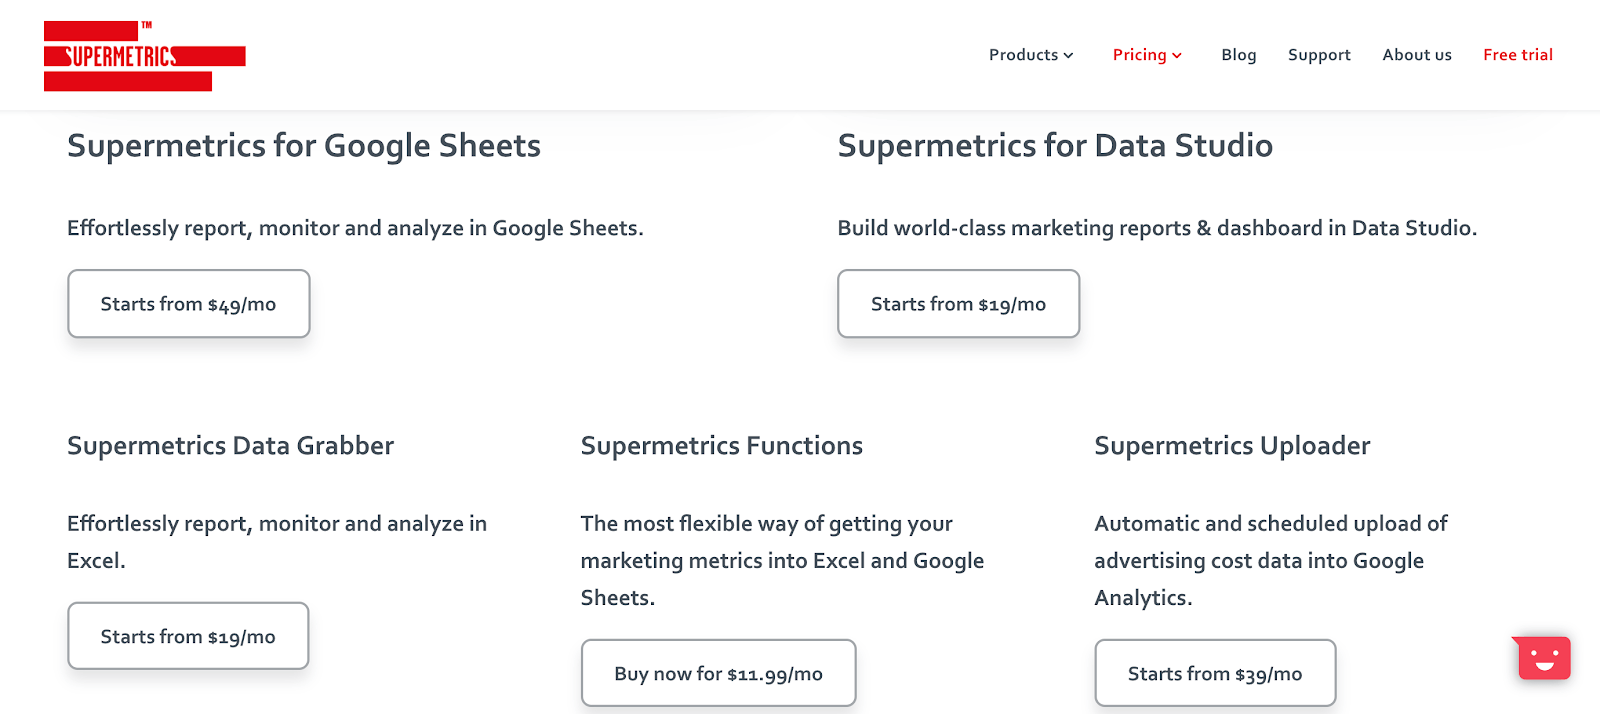 Supermetric's pricing